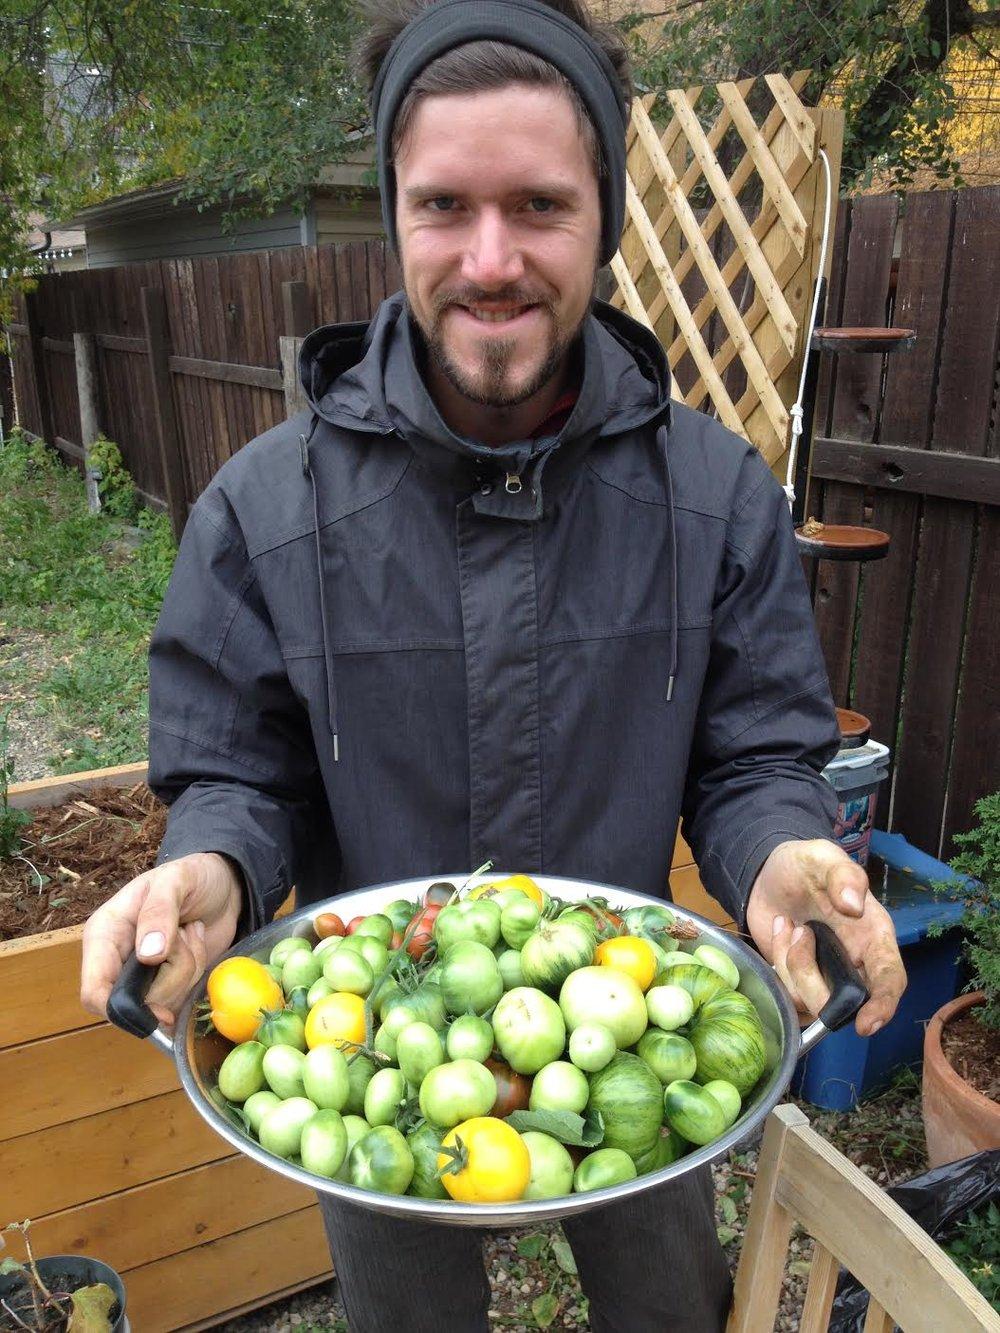 Adrian Werner - NatureCity Festival Volunteer